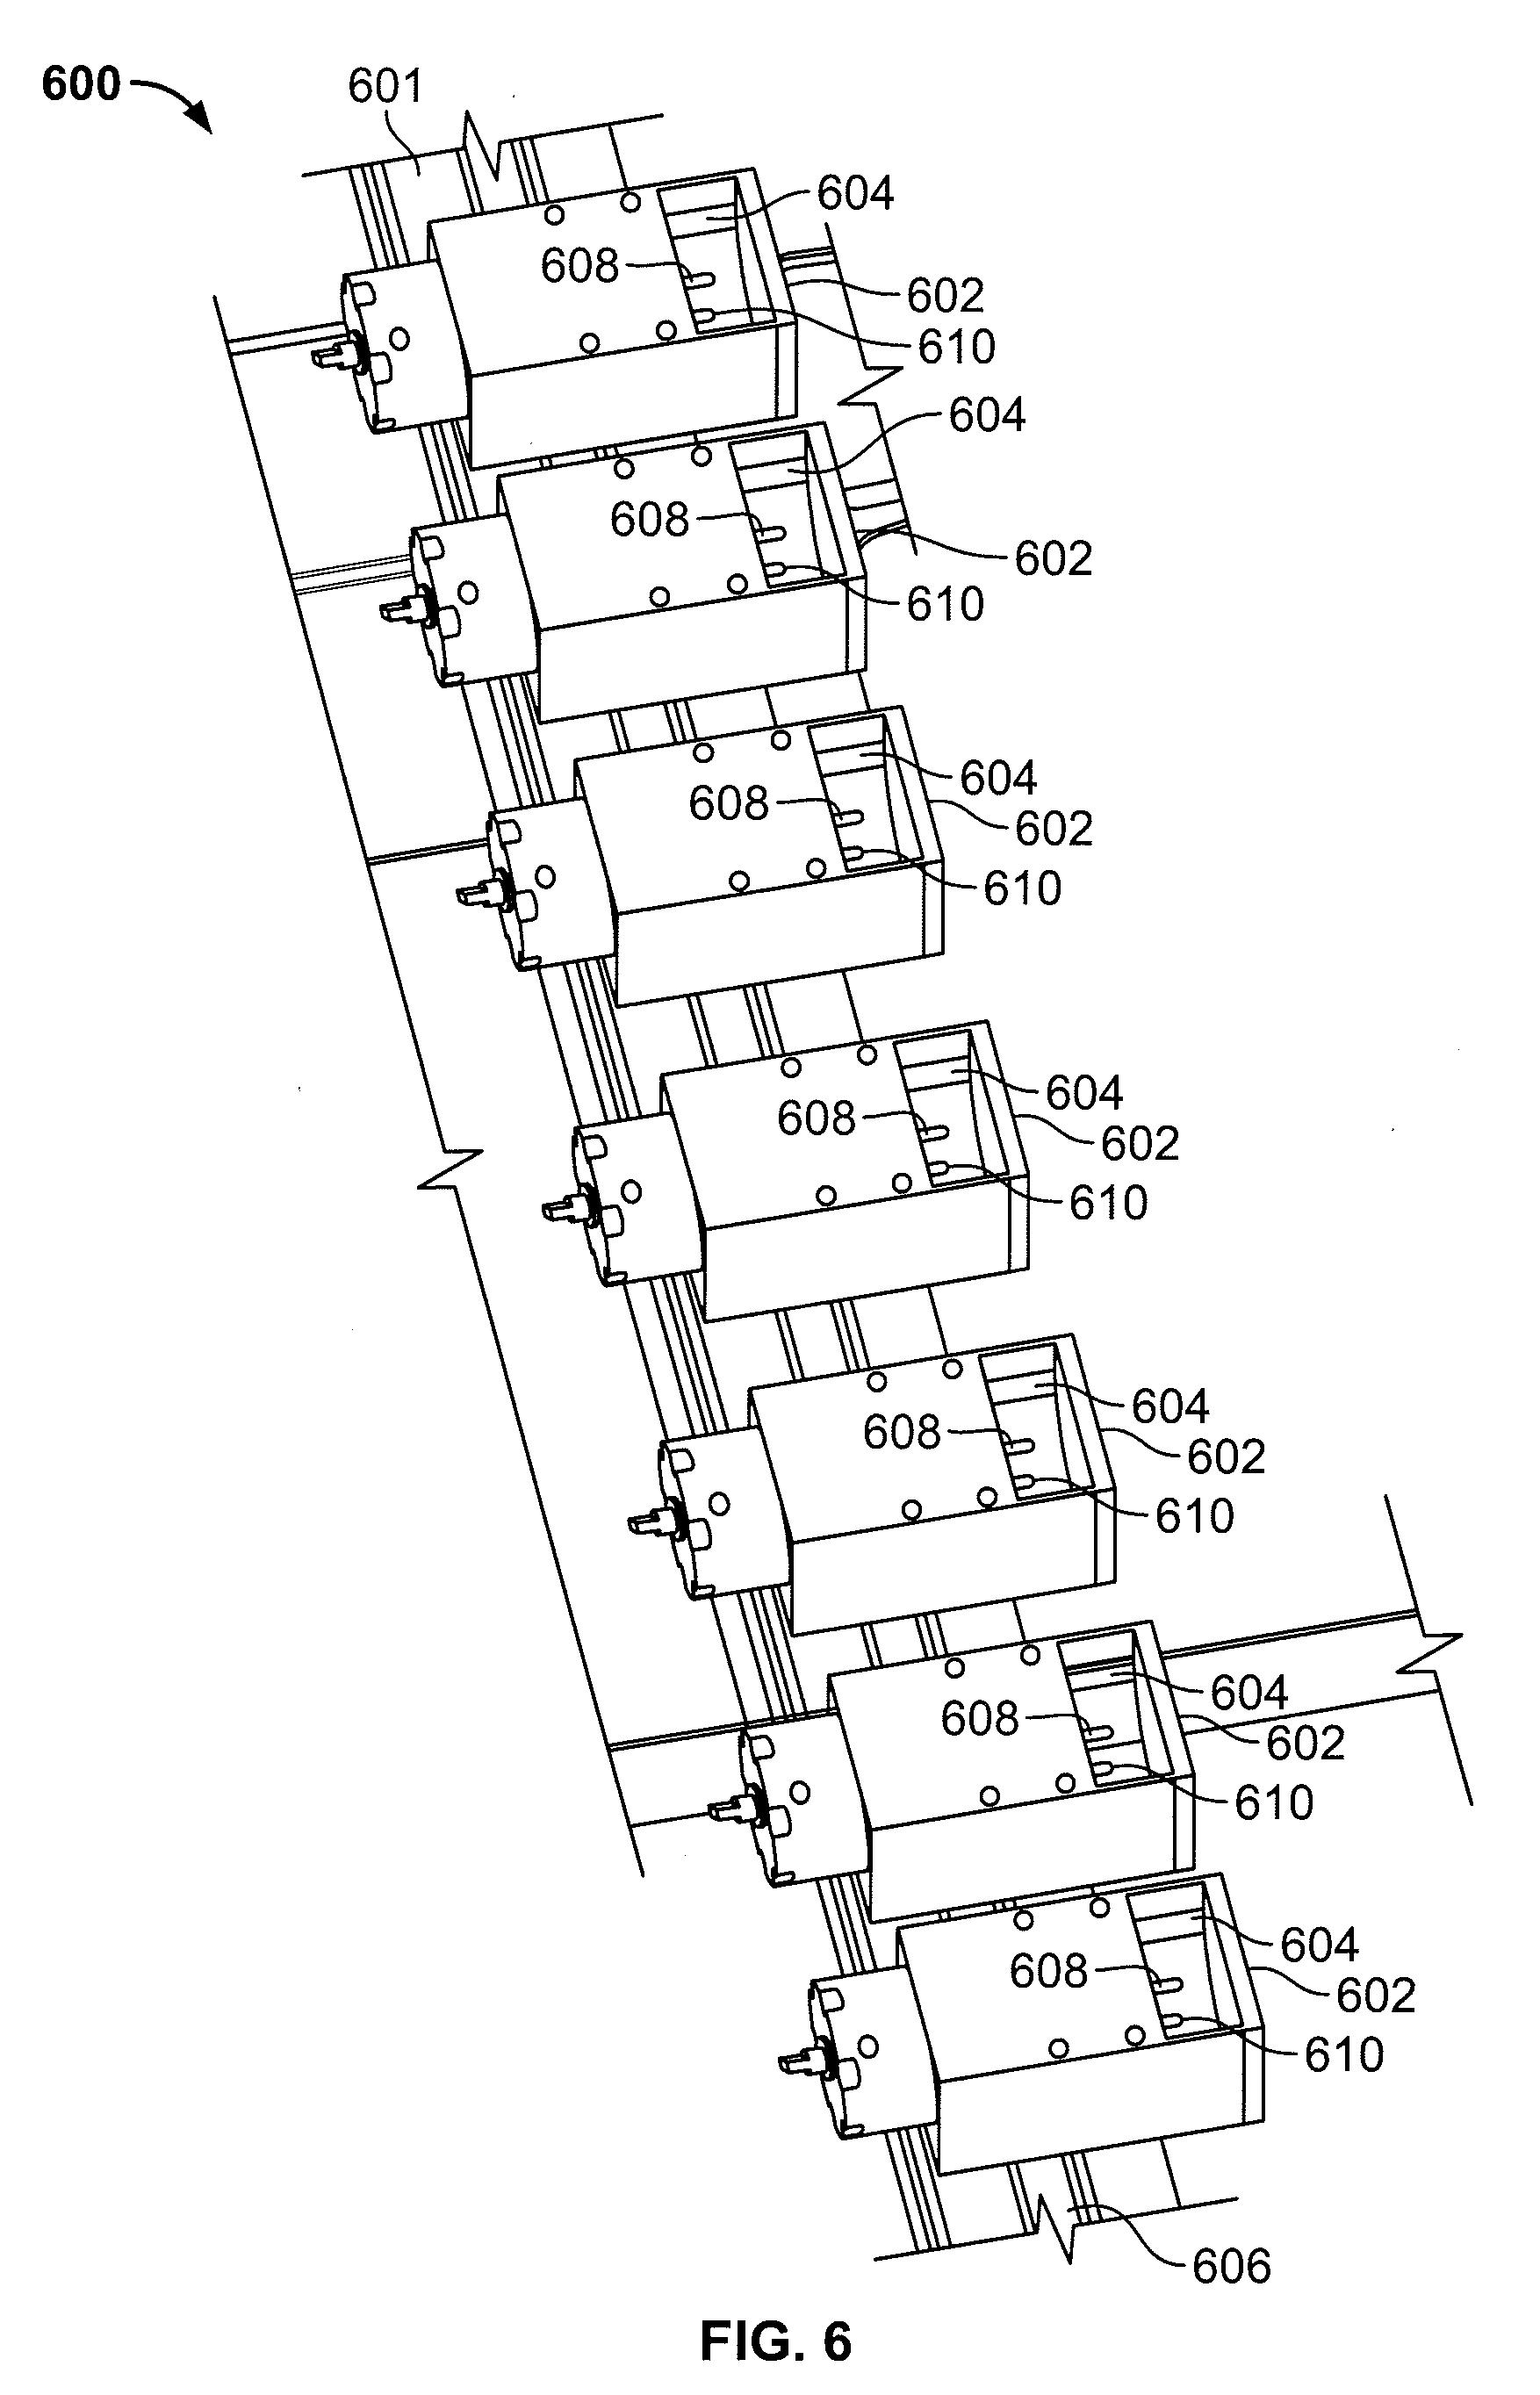 alternator wiring diagram for mf 245 mf 35 wiring diagram